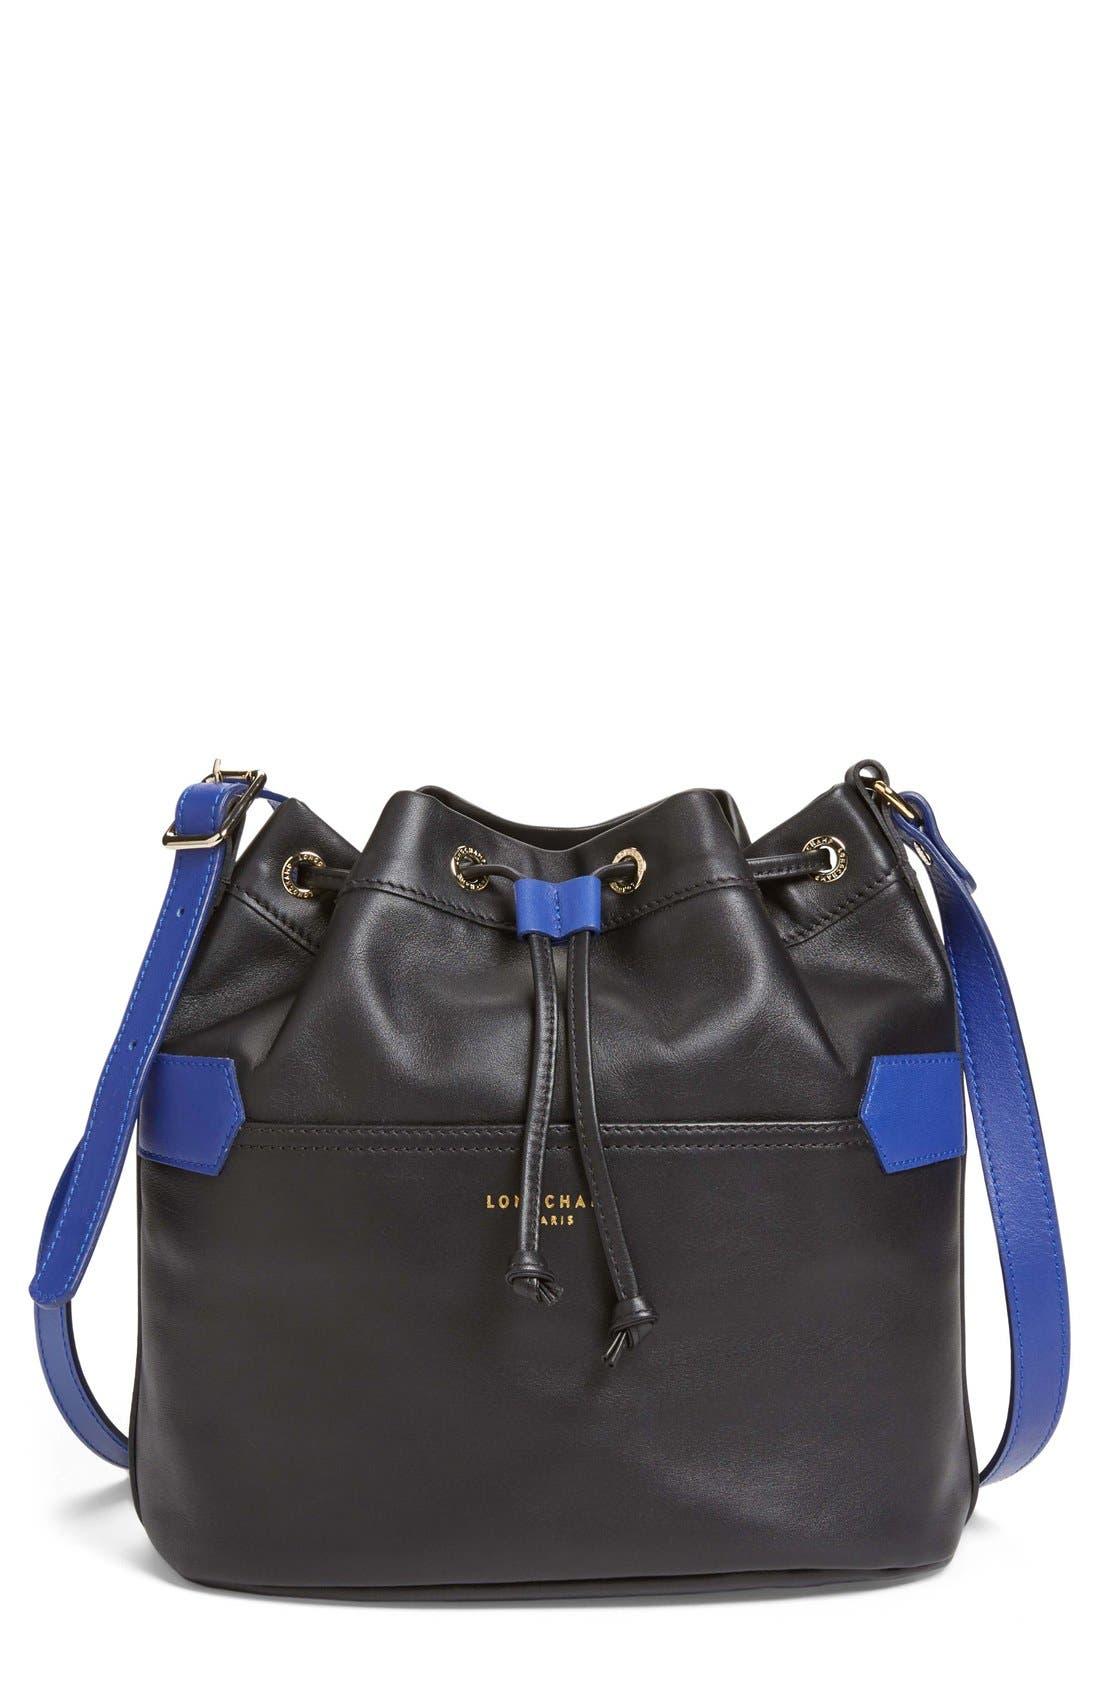 LONGCHAMP '2.0' Leather Bucket Bag, Main, color, 001